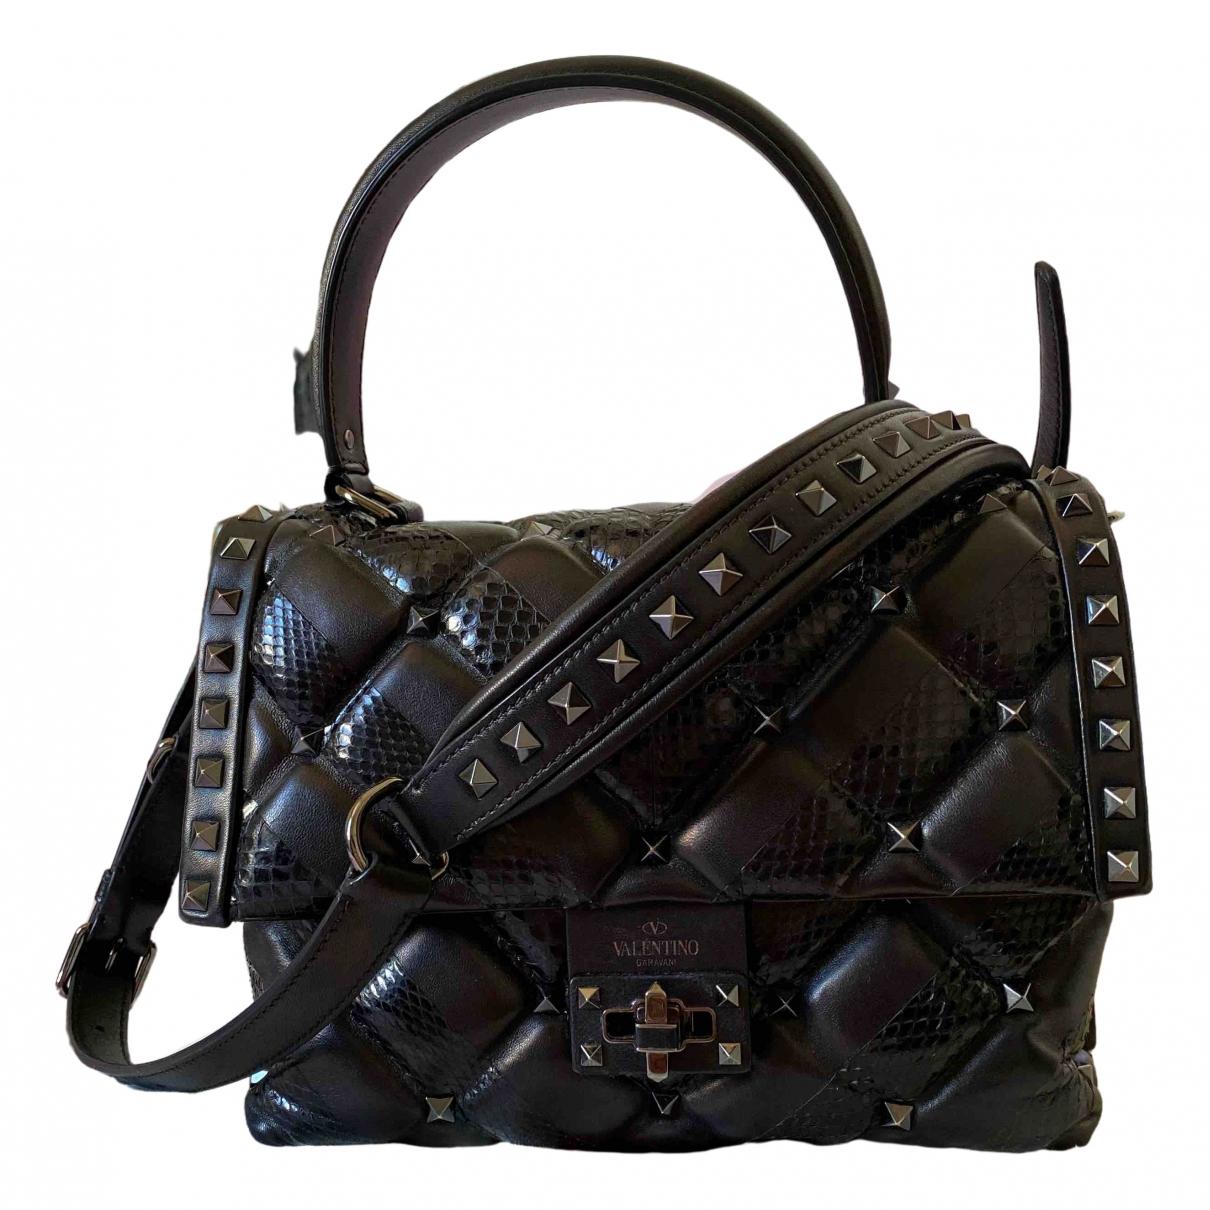 Valentino Garavani - Sac a main CandyStud pour femme en cuir - noir